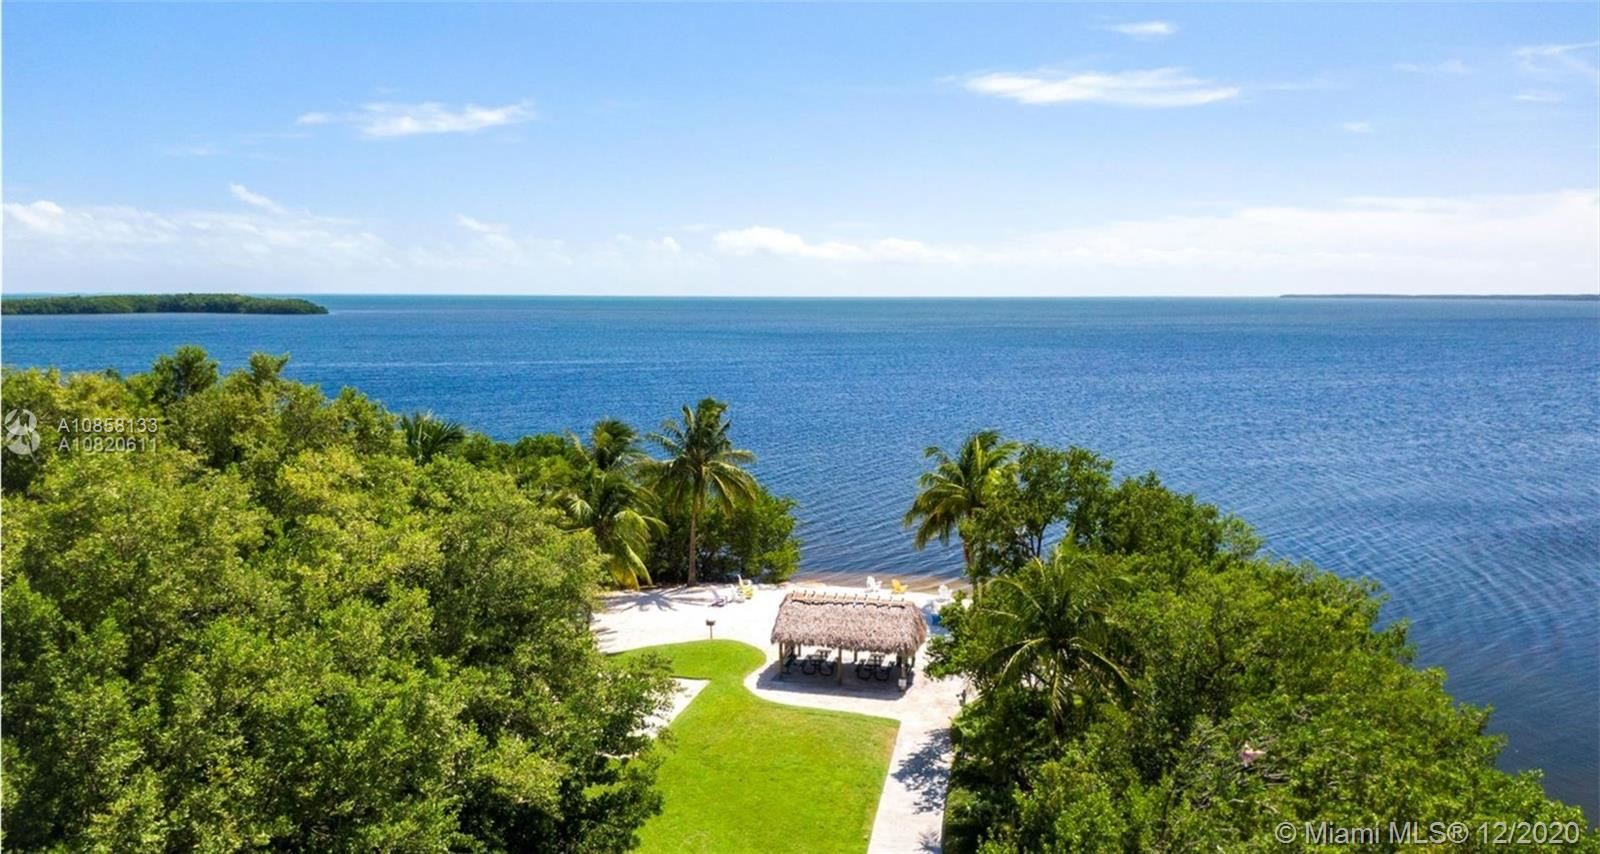 6020 Paradise Point Dr, Palmetto Bay, FL 33157 - #: A10858133